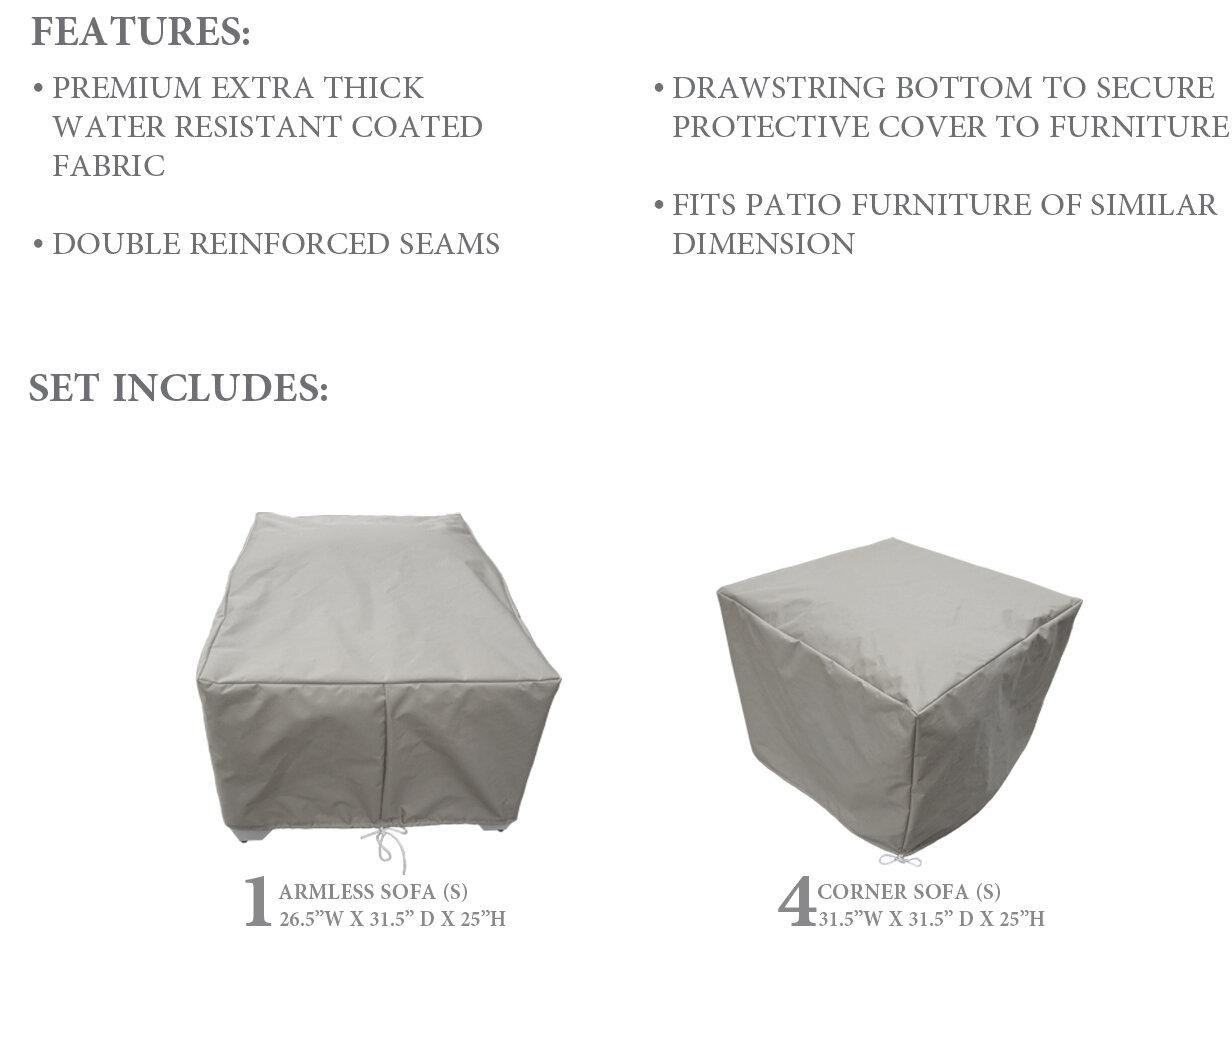 Tremendous Fernando Protective 5 Piece Water Resistant Patio Furniture Cover Set Download Free Architecture Designs Scobabritishbridgeorg